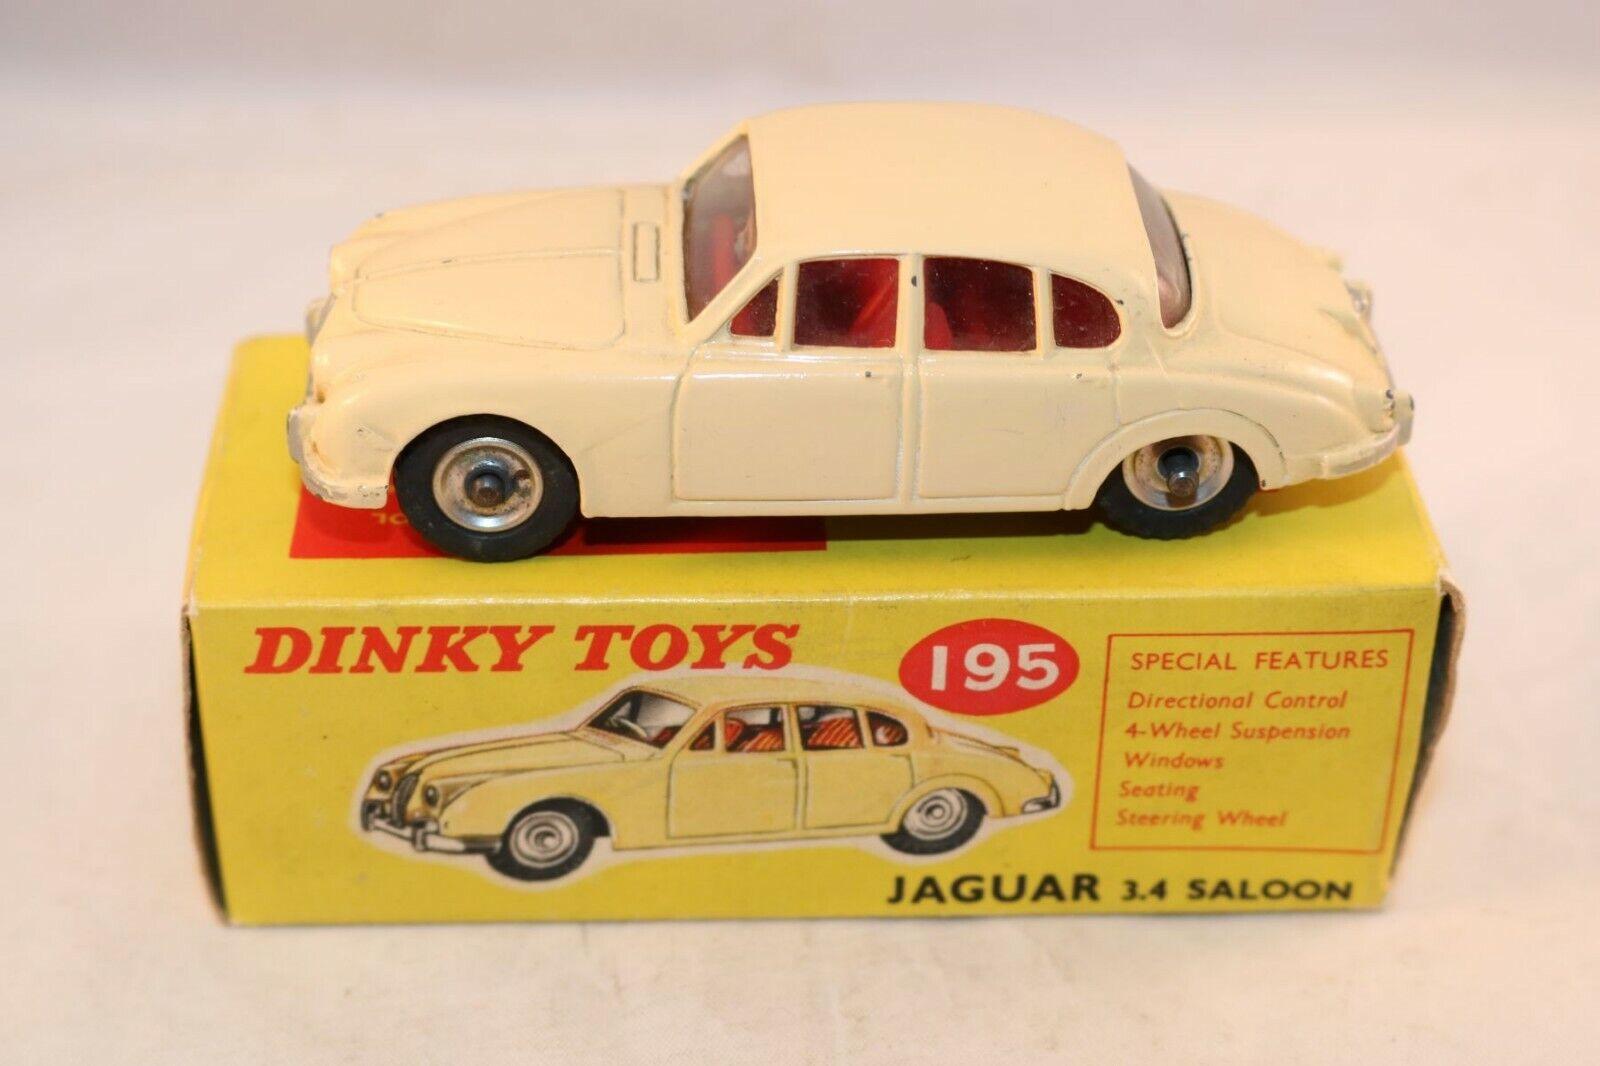 Dinky Toys 195 Jaguar 3.4 Saloon cream very near mint in box all original